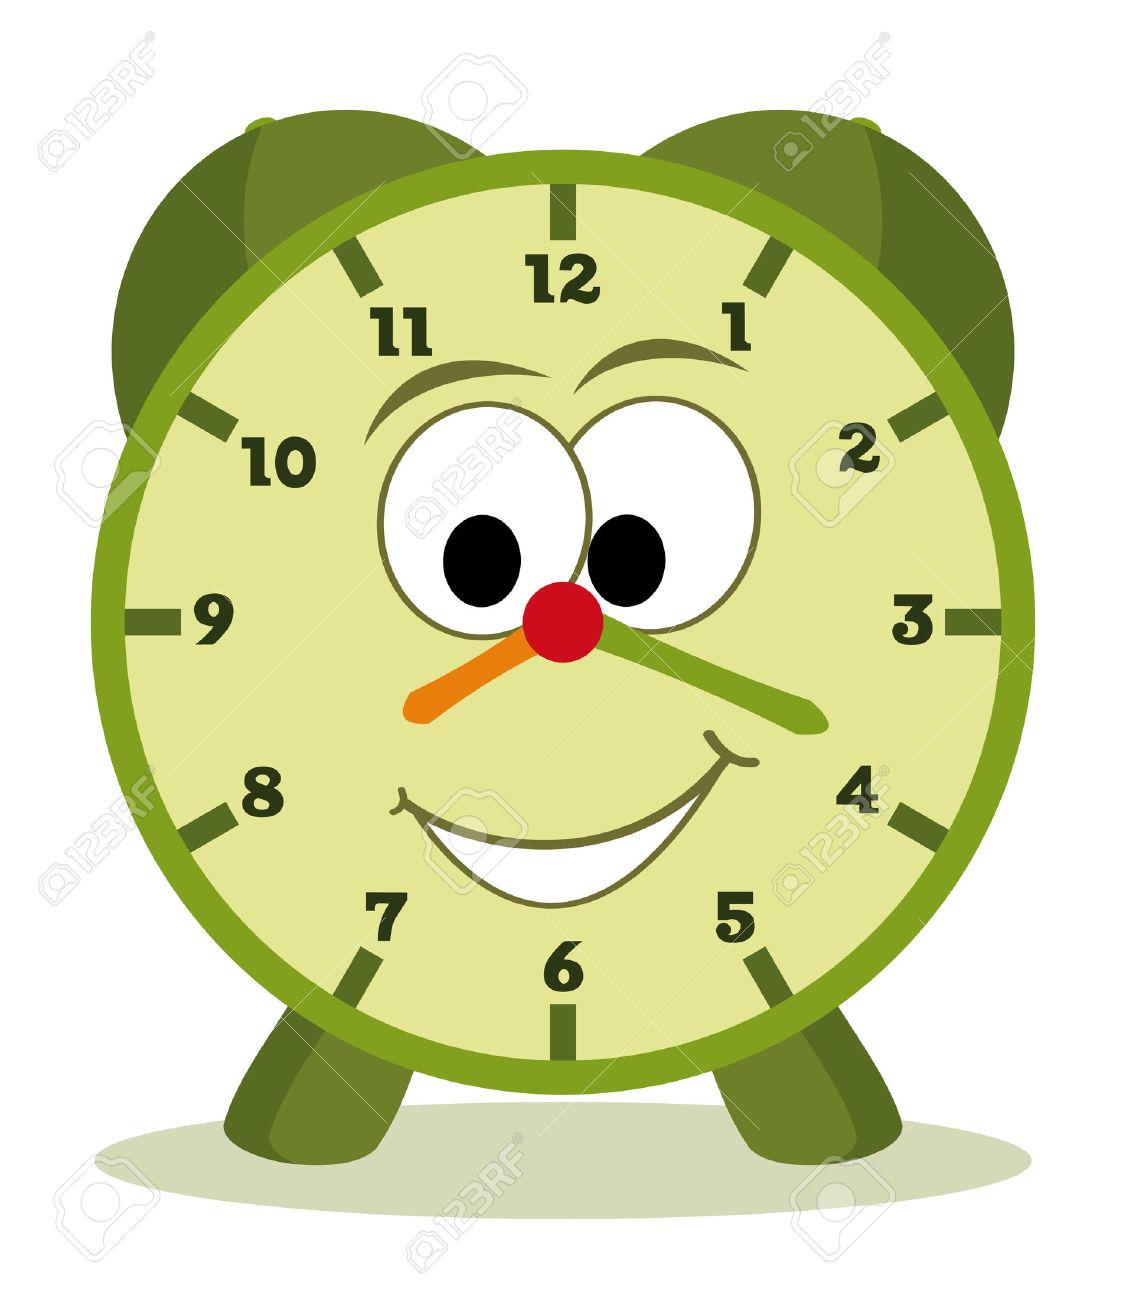 ... Im Genes De Archivo Vectores Reloj Caricatura #Kl8KZV - Clipart Kid